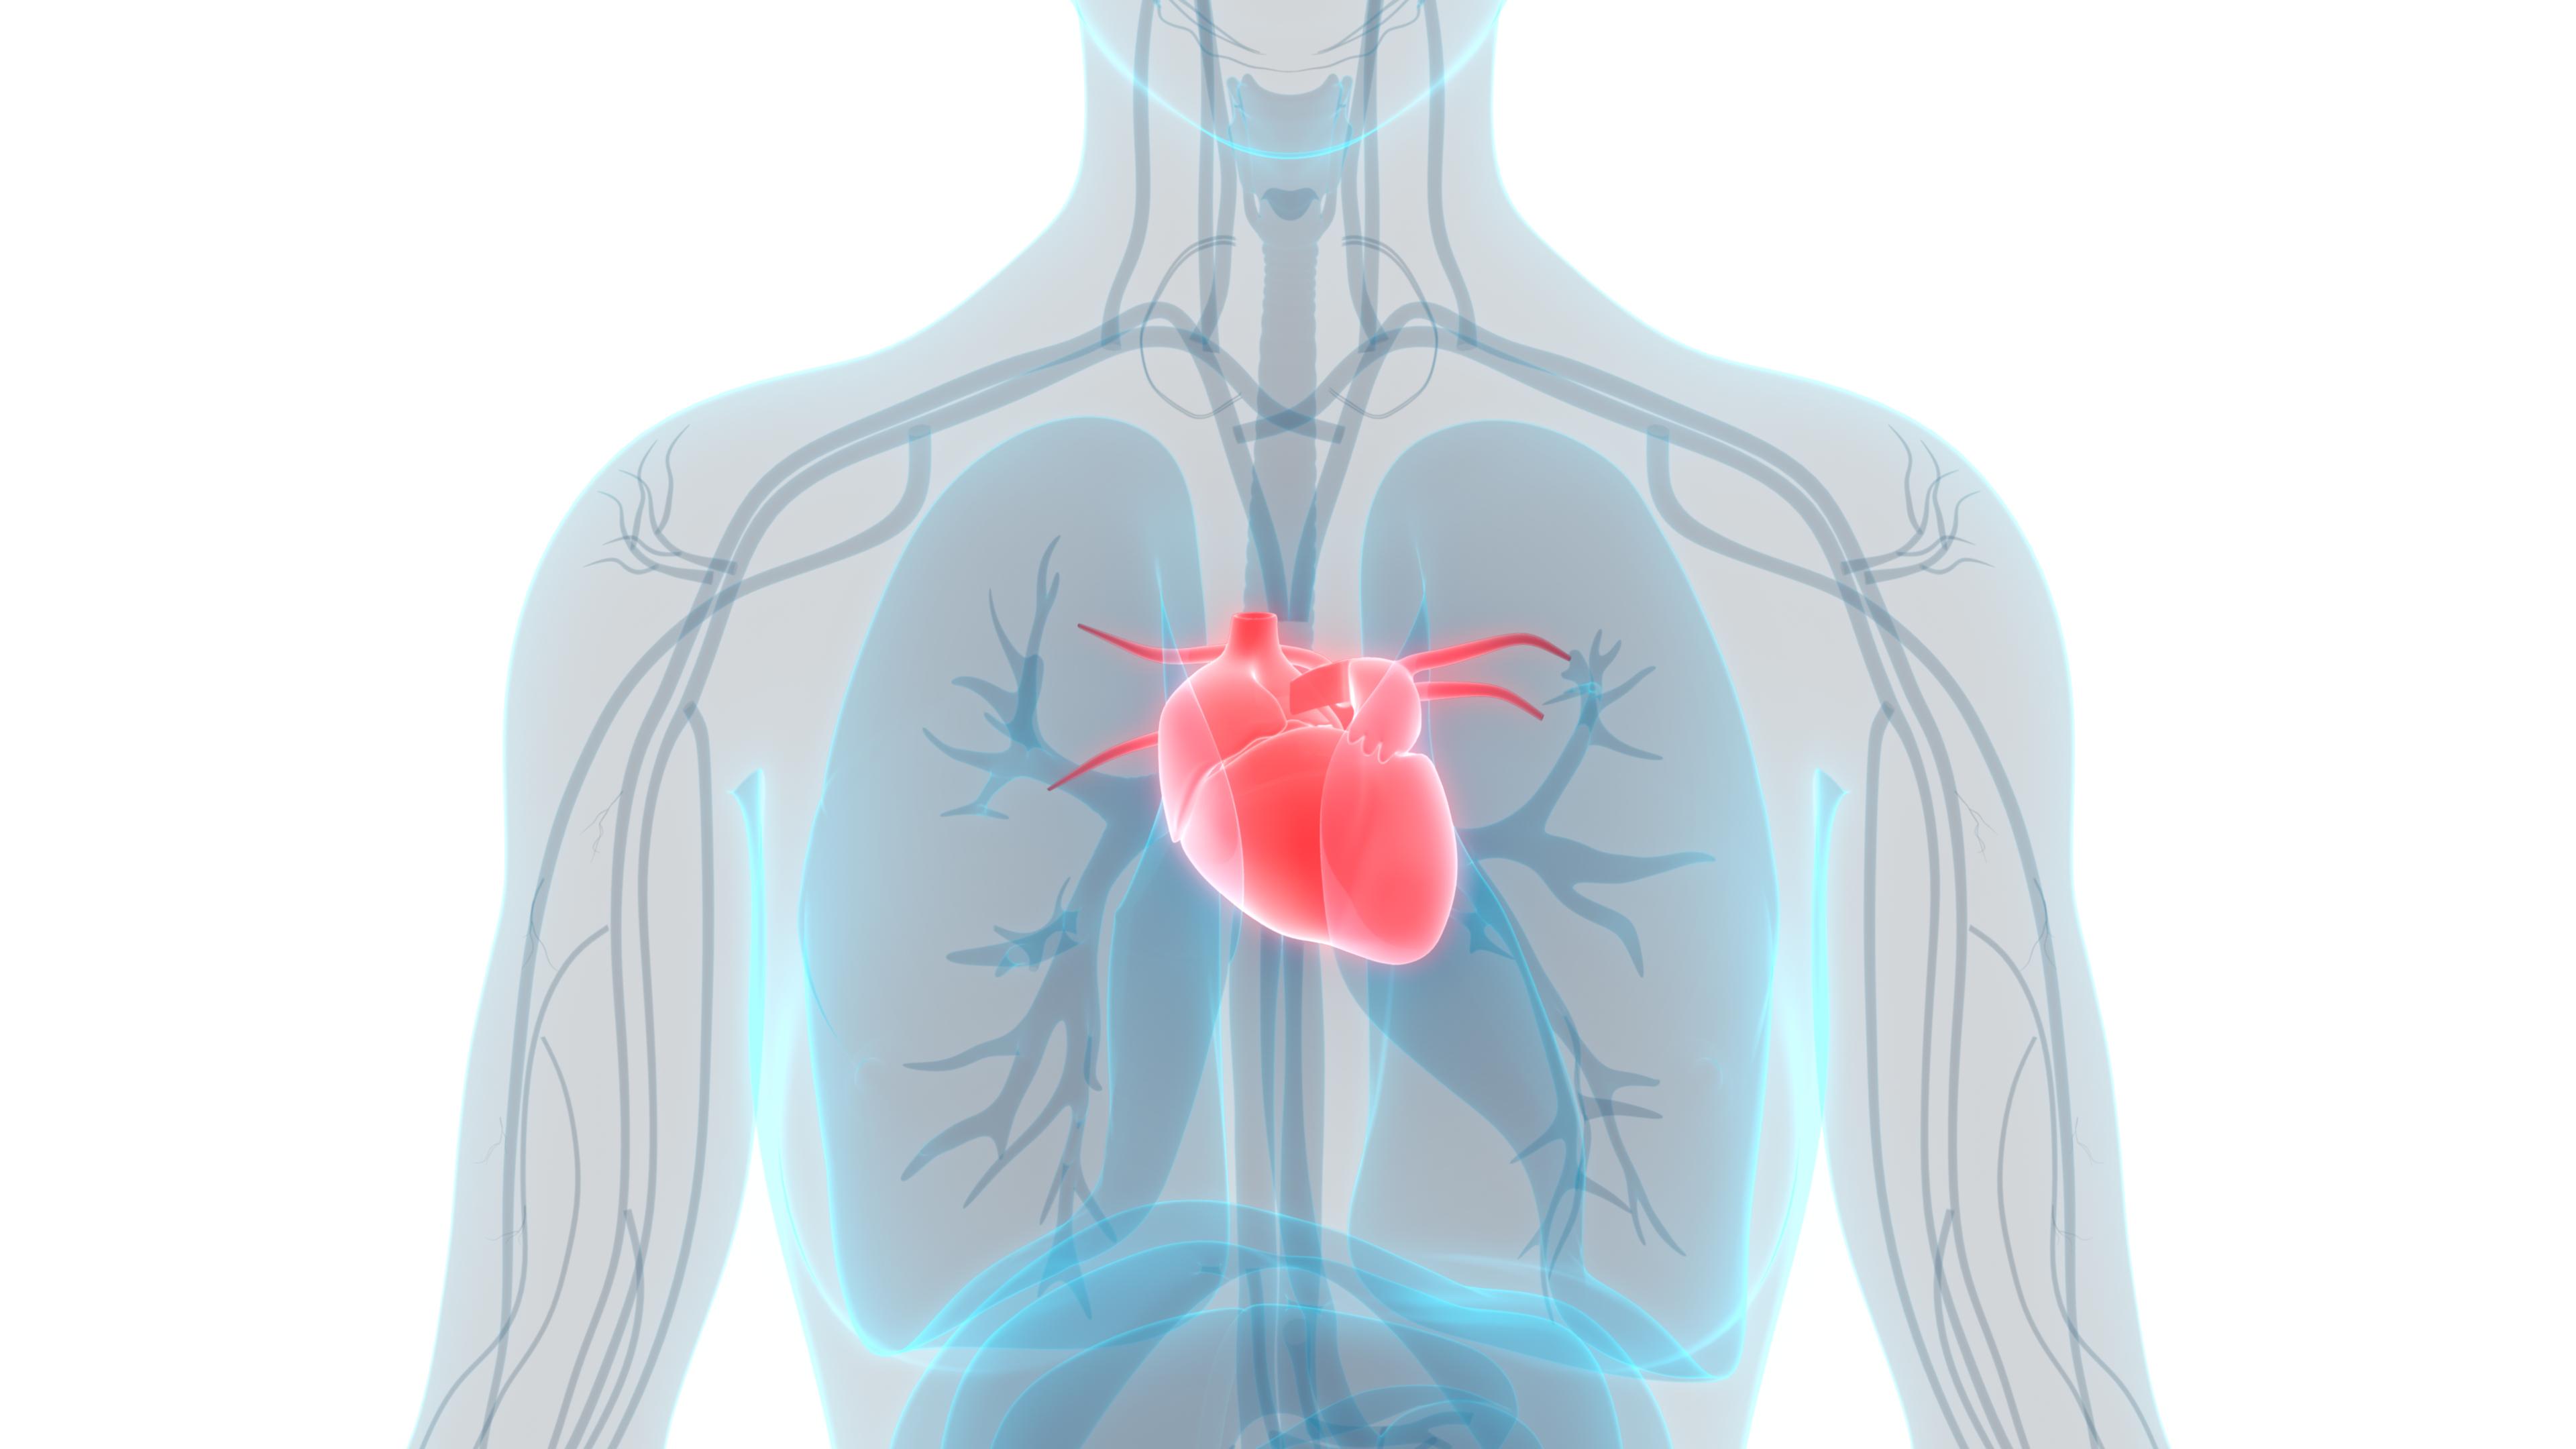 Binge drinking found to impair vascular function